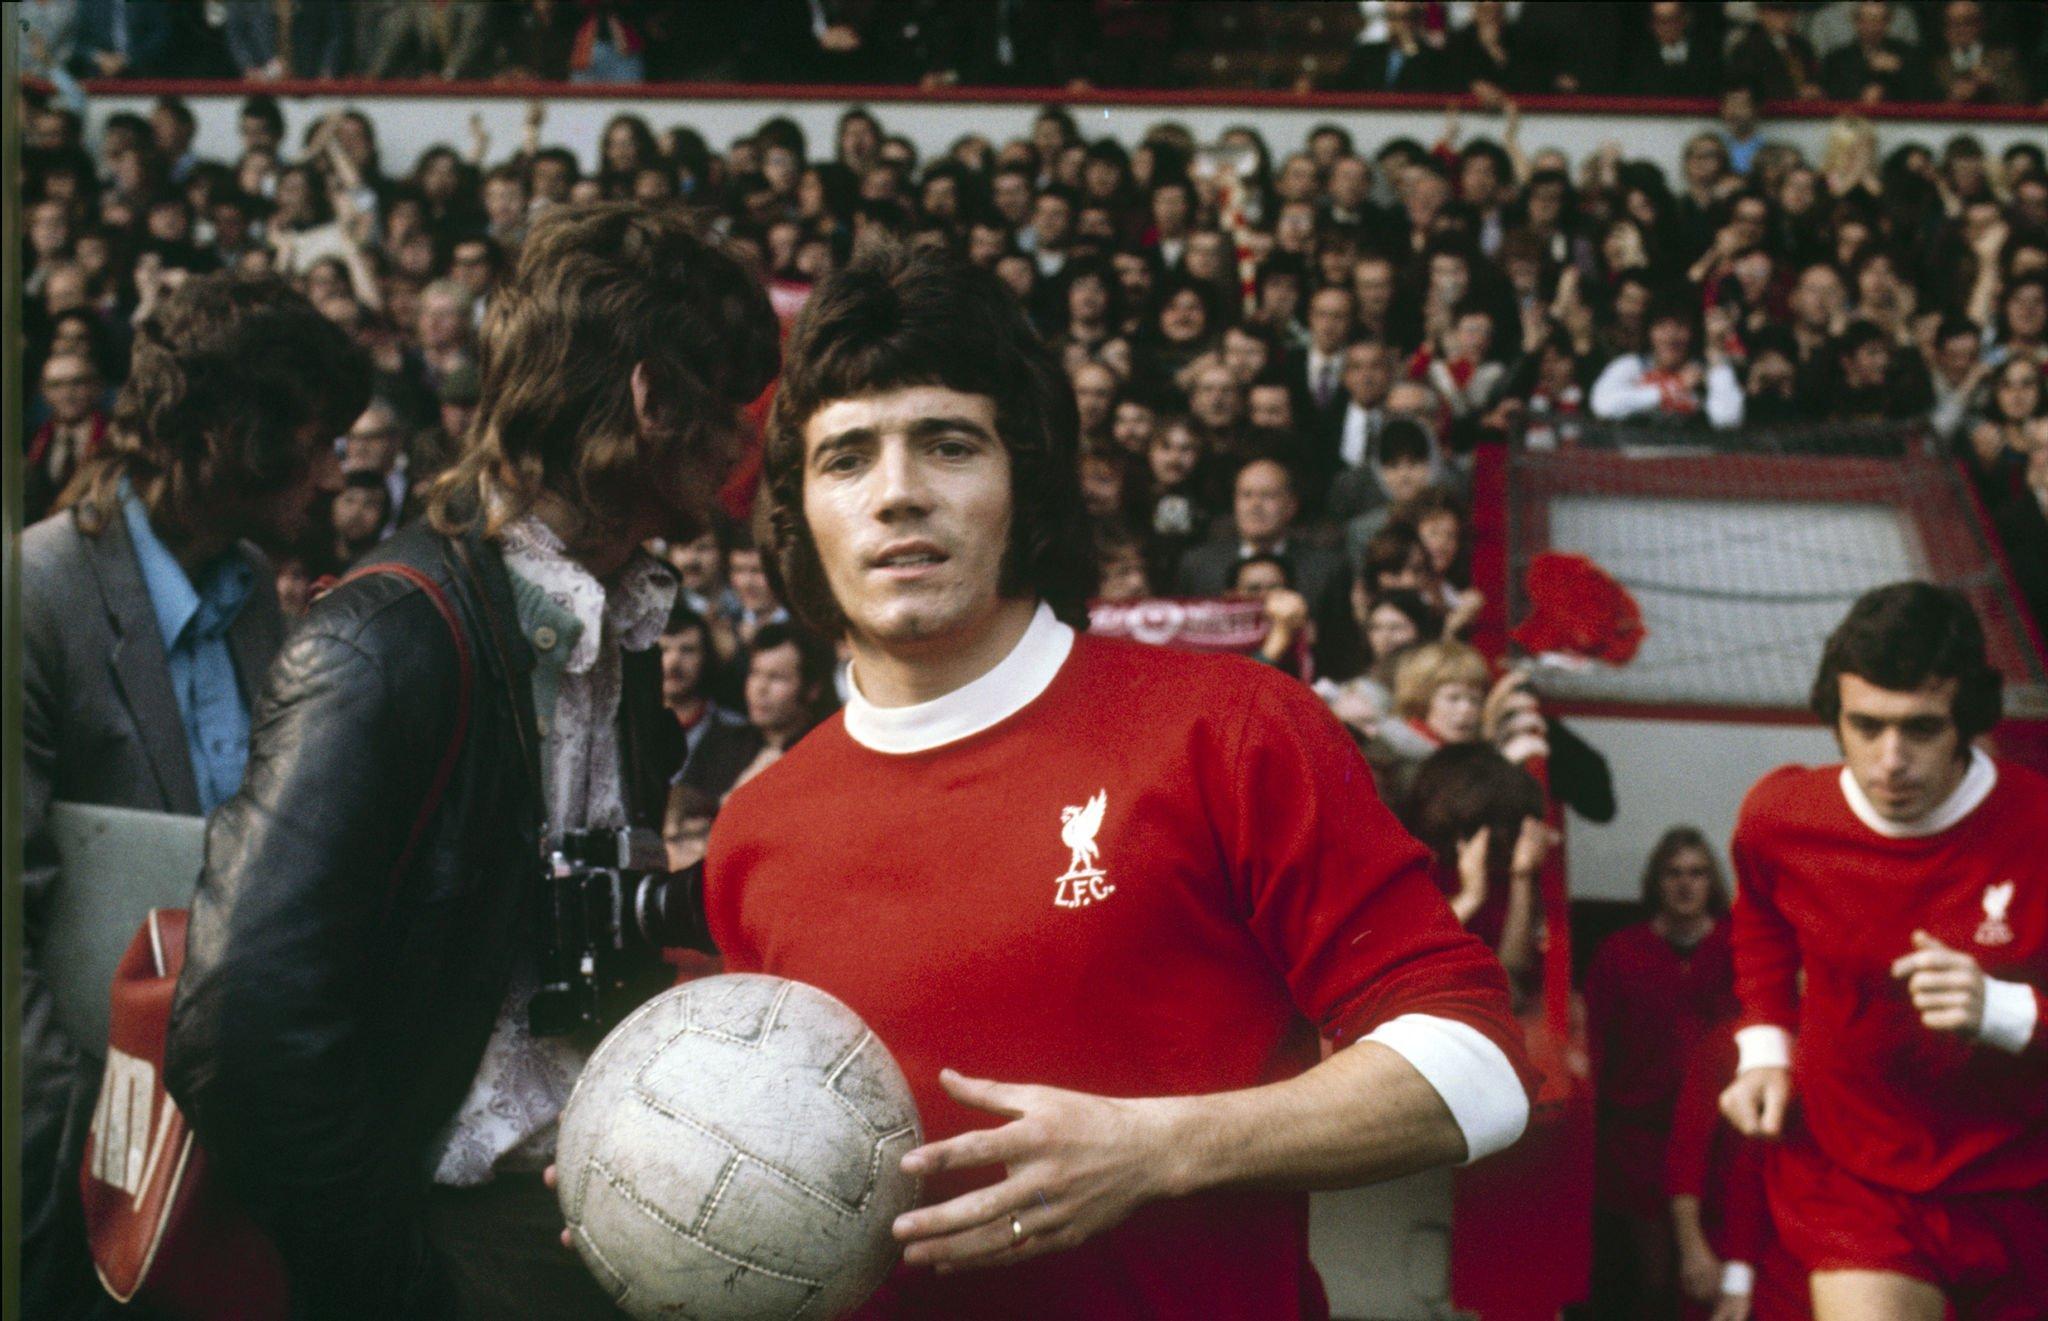 Happy 67th birthday to Liverpool legend Kevin Keegan!